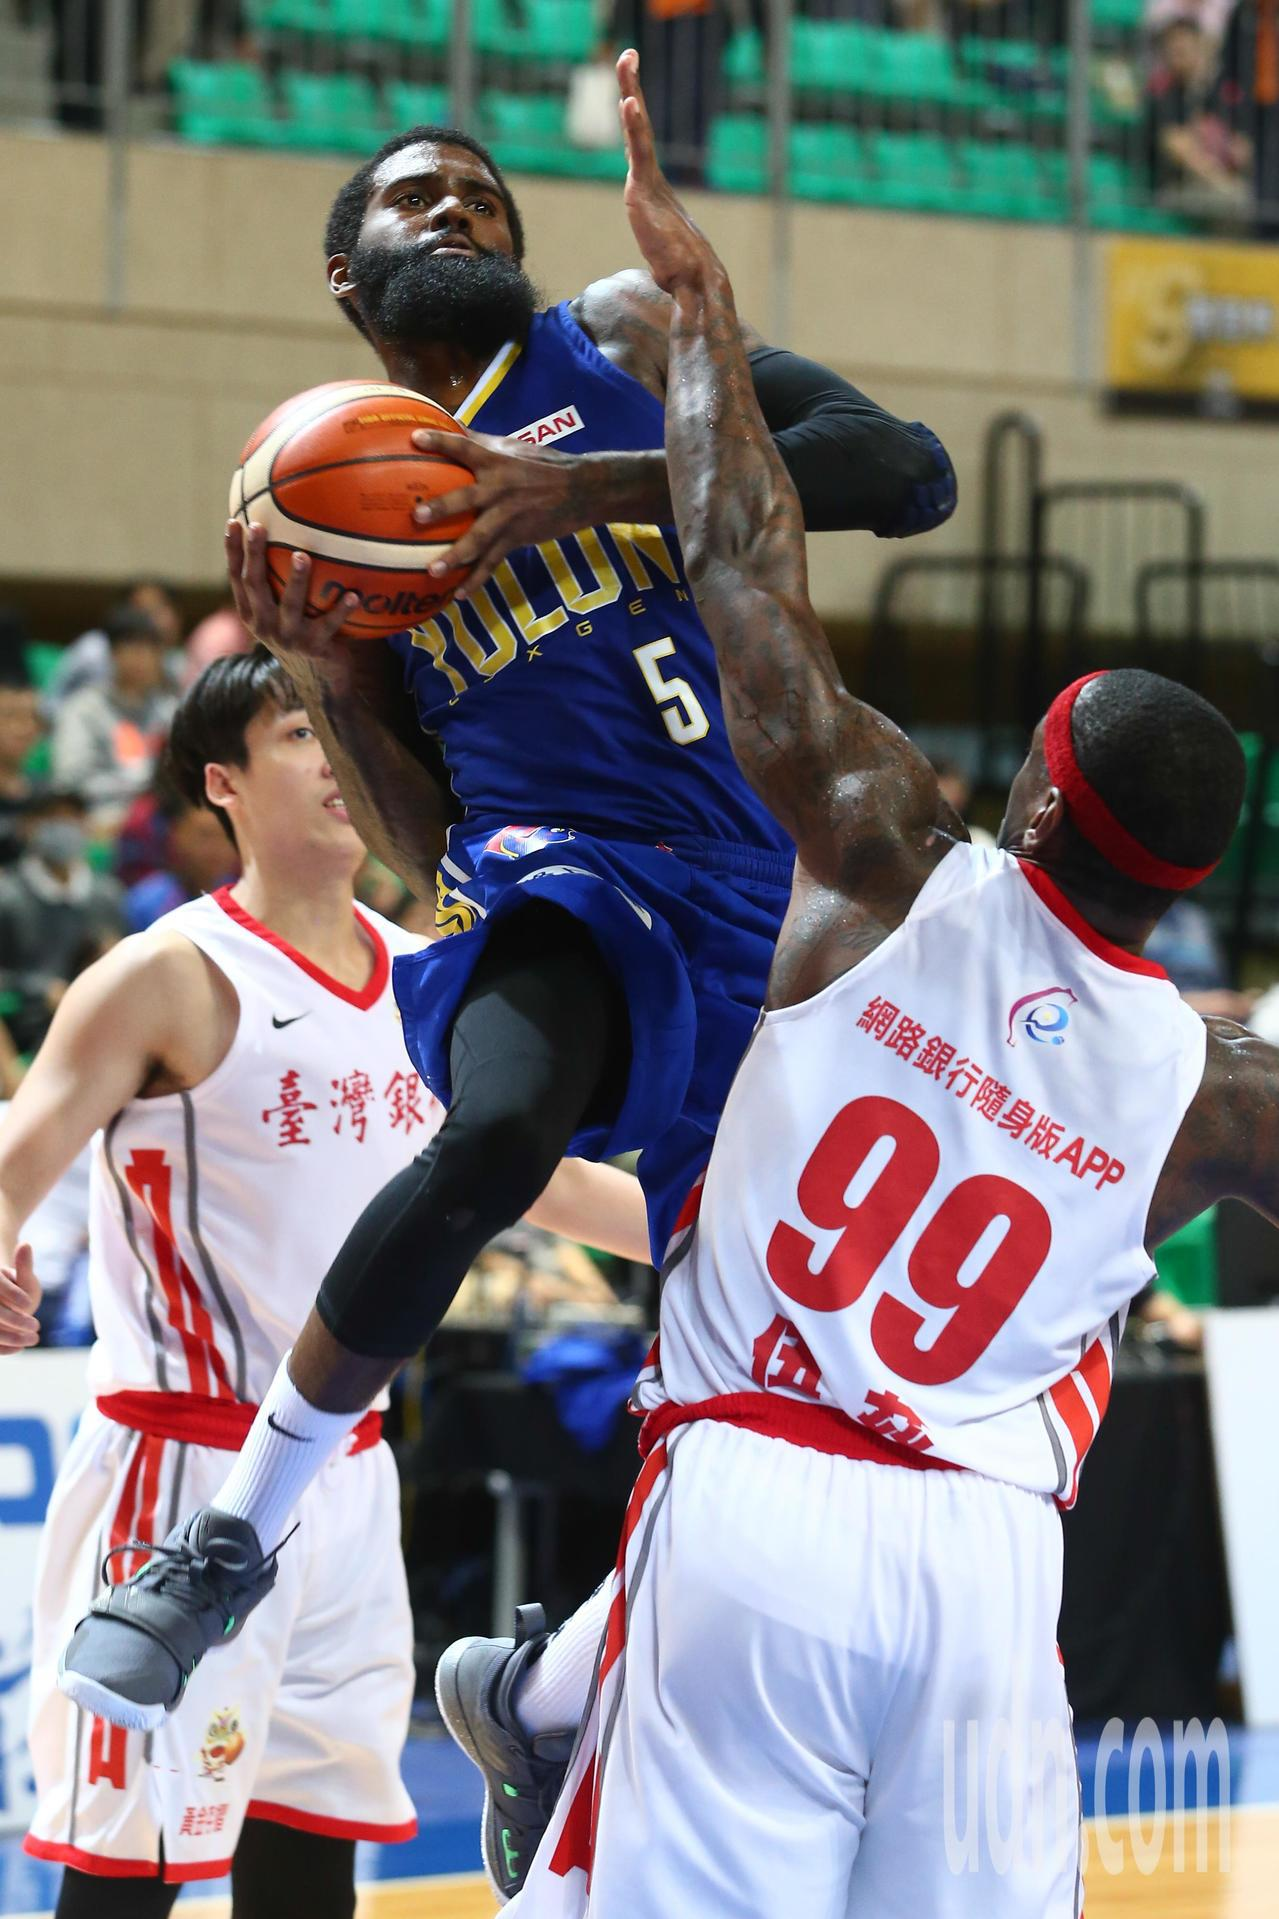 SBL超級籃球聯賽今晚在天母開打,洋將Terry Thomas(中)拿下本季新高...